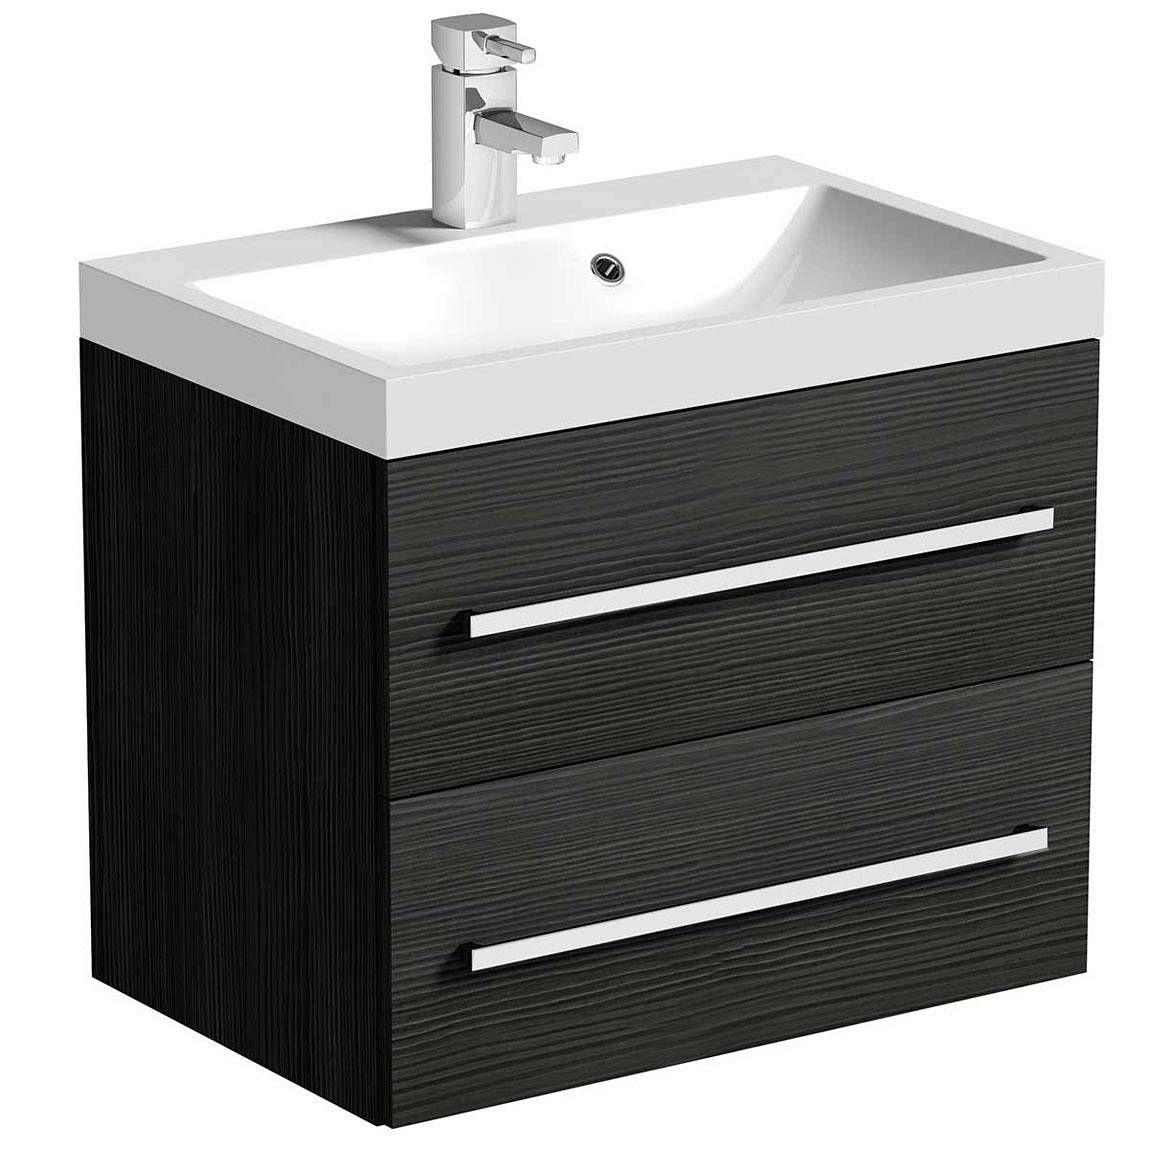 drift grey 2 drawer wall hung unit inset basin victoria plumb 199 - Bathroom Accessories Victoria Plumb